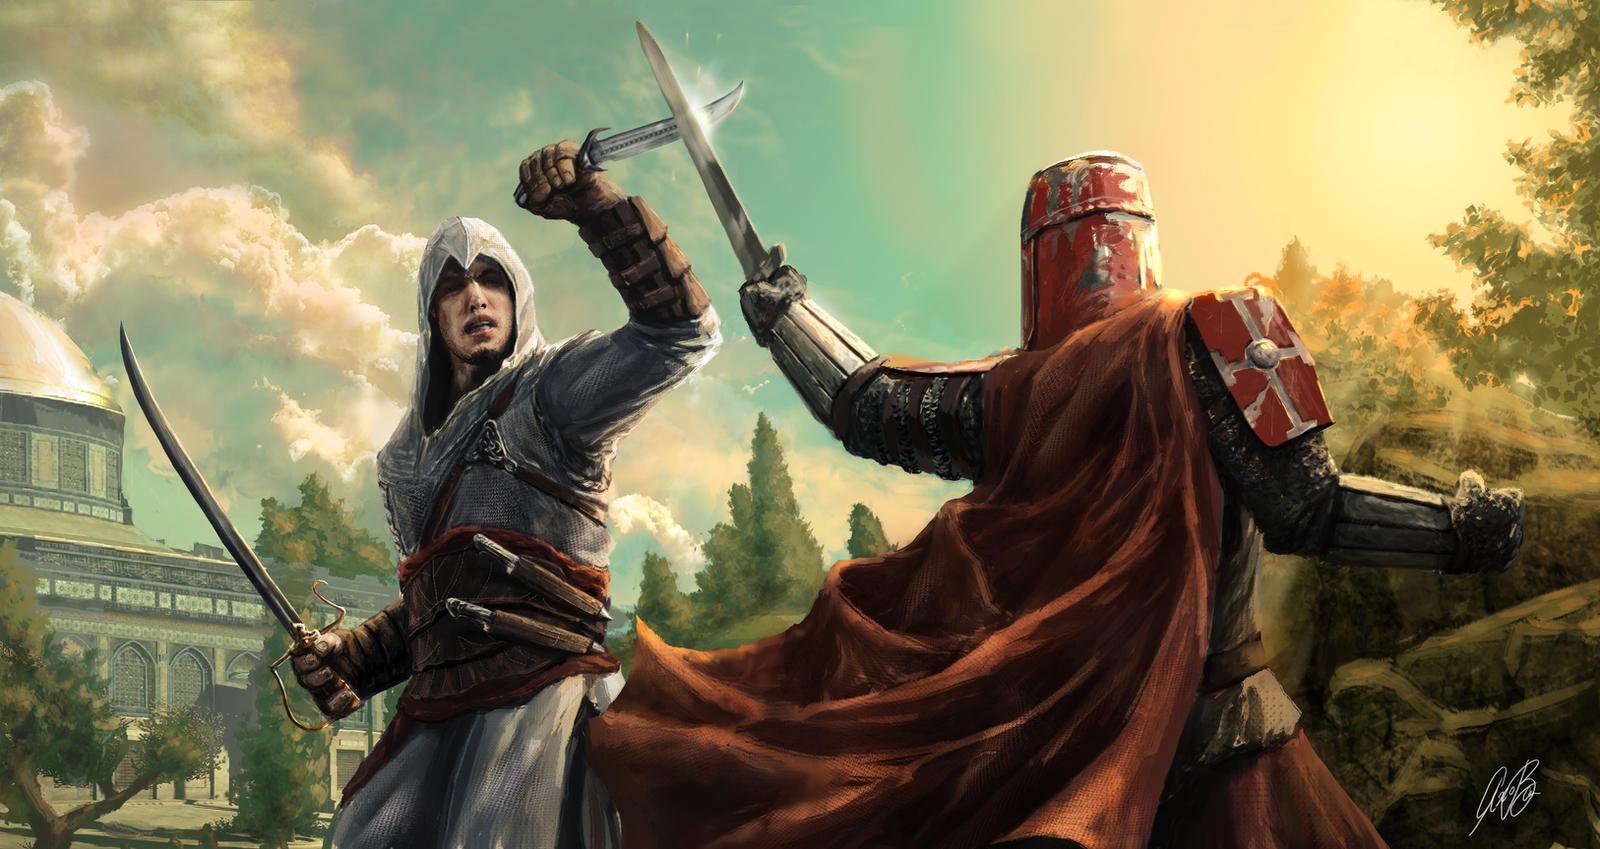 Pubg By Sodano On Deviantart: Altair's Fight By Entar0178 On DeviantArt